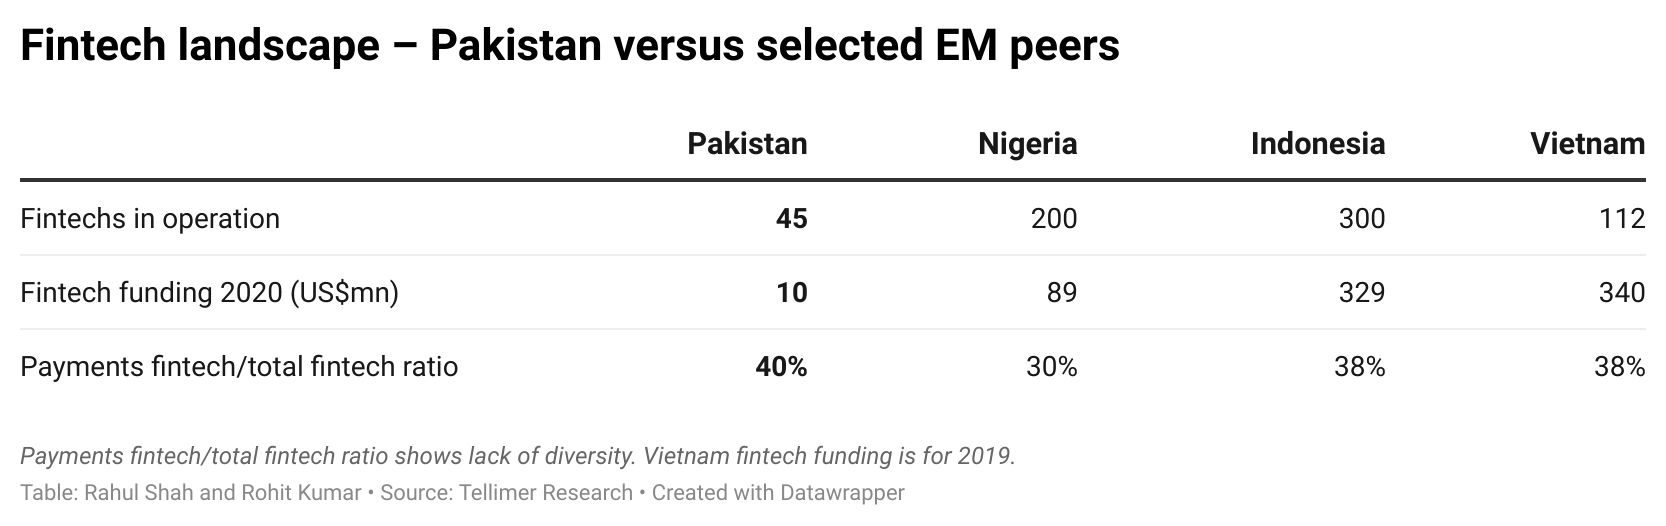 Fintech landscape – Pakistan versus selected EM peers